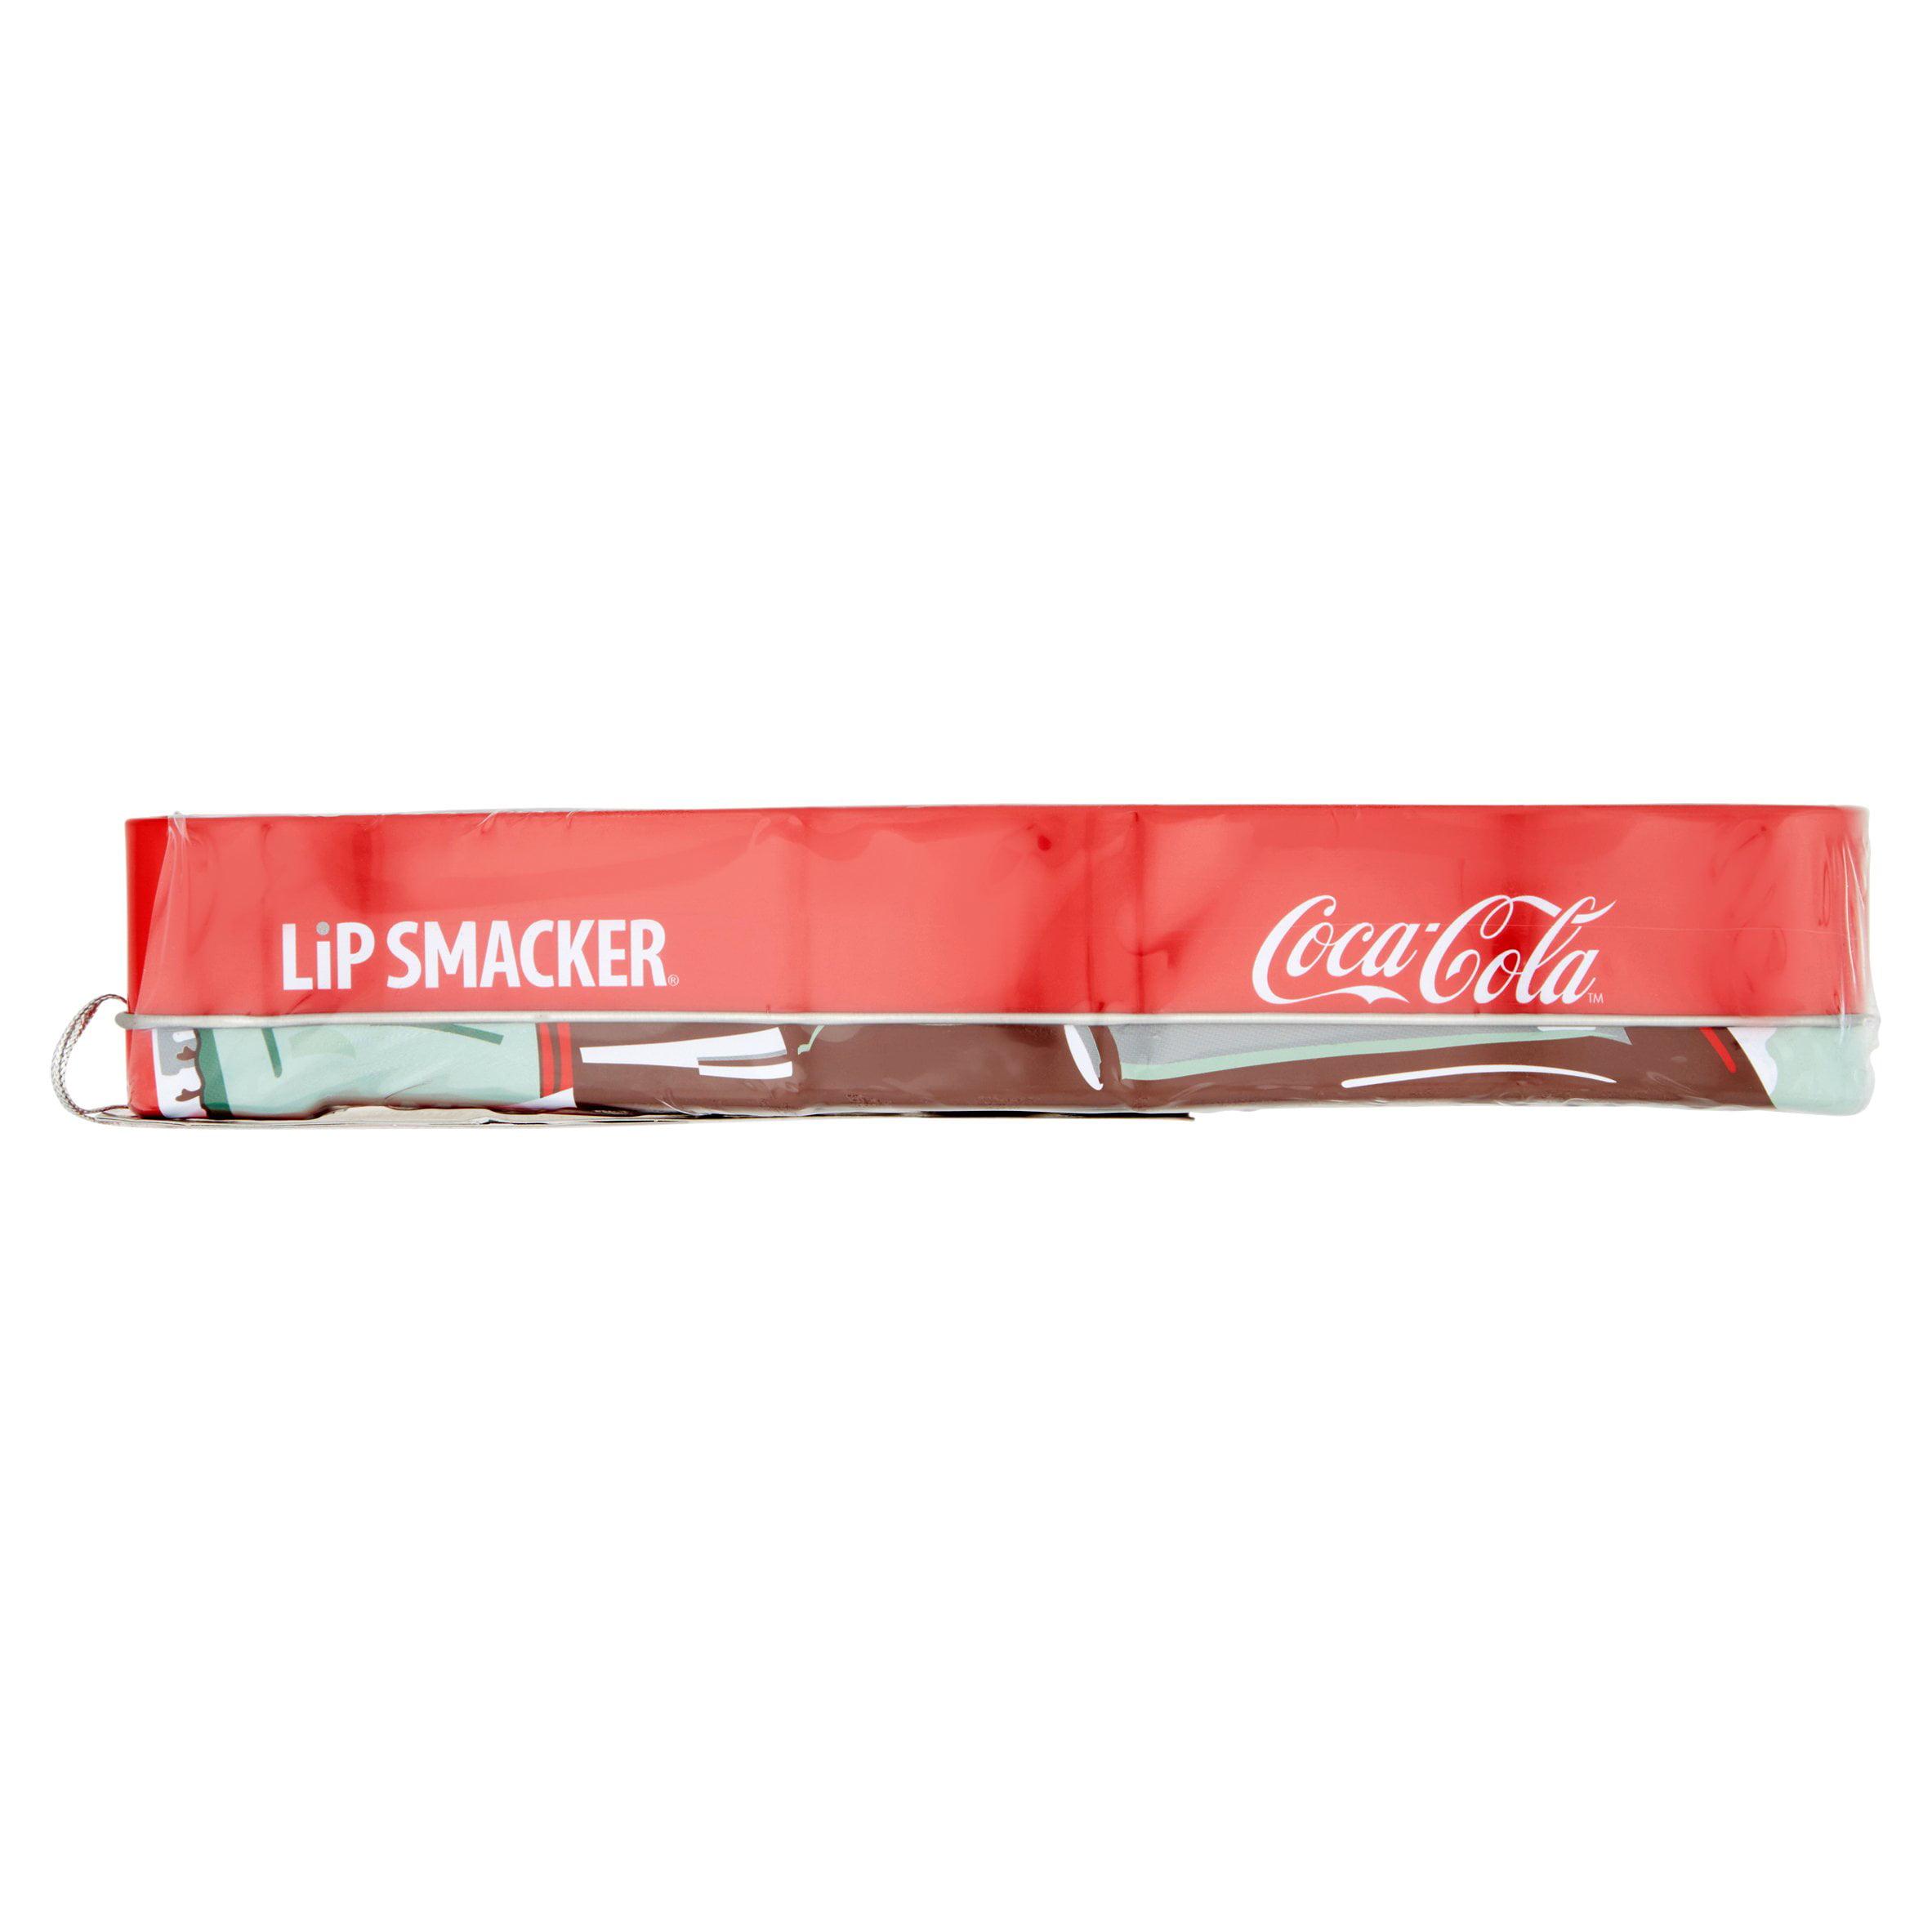 Lip Smacker Coca-Cola Flavored Lip Balm, 4 count, 0.56 oz - Walmart.com